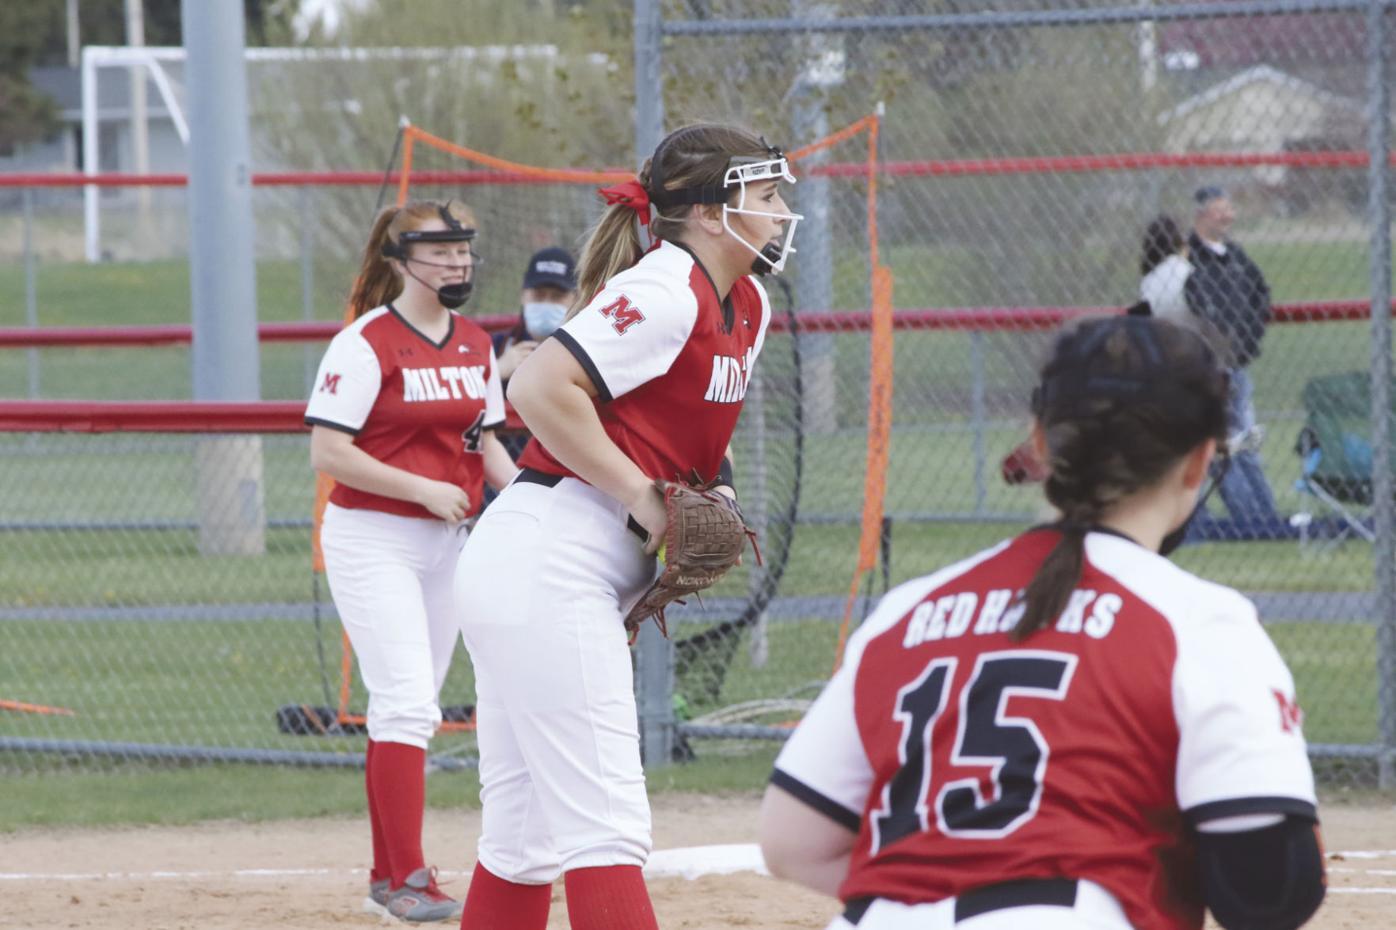 Milton softball at home April 29, 2021